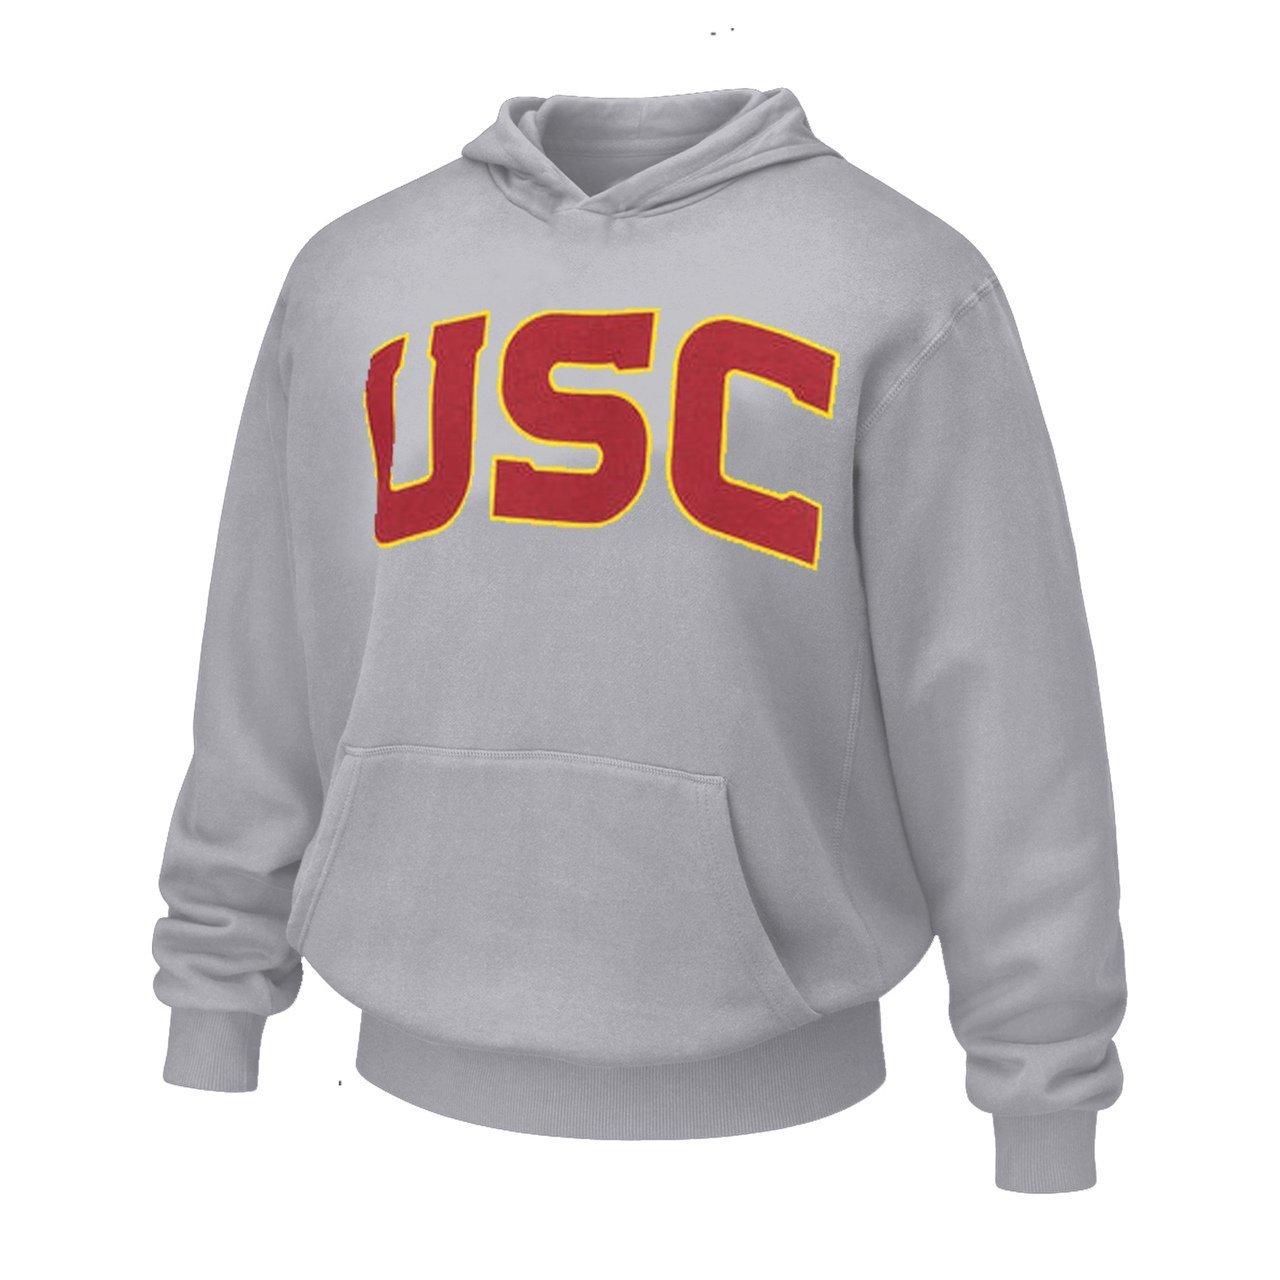 USC Trojans Adult Wordmark Hooded Sweatshirt - Gray